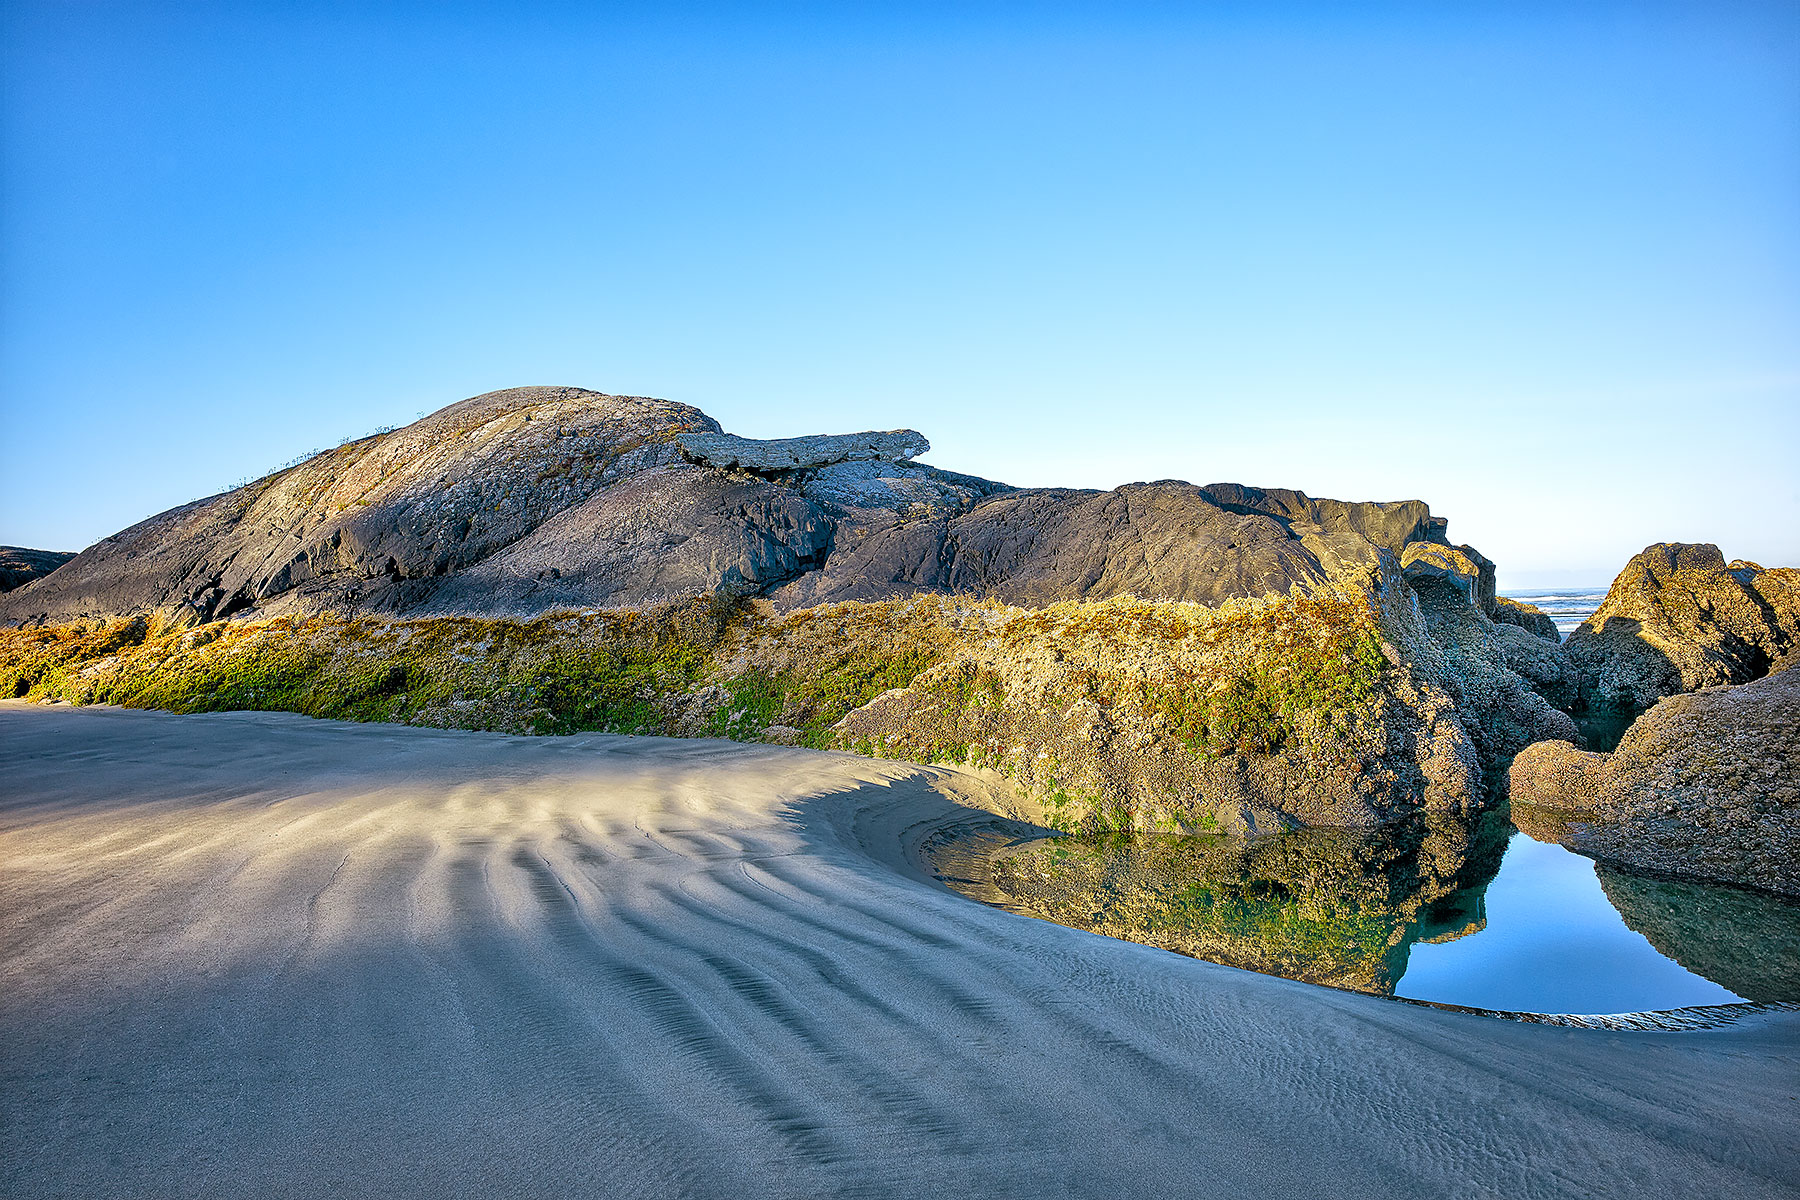 First Light, Pacific Rim National Park ©johncameron.ca